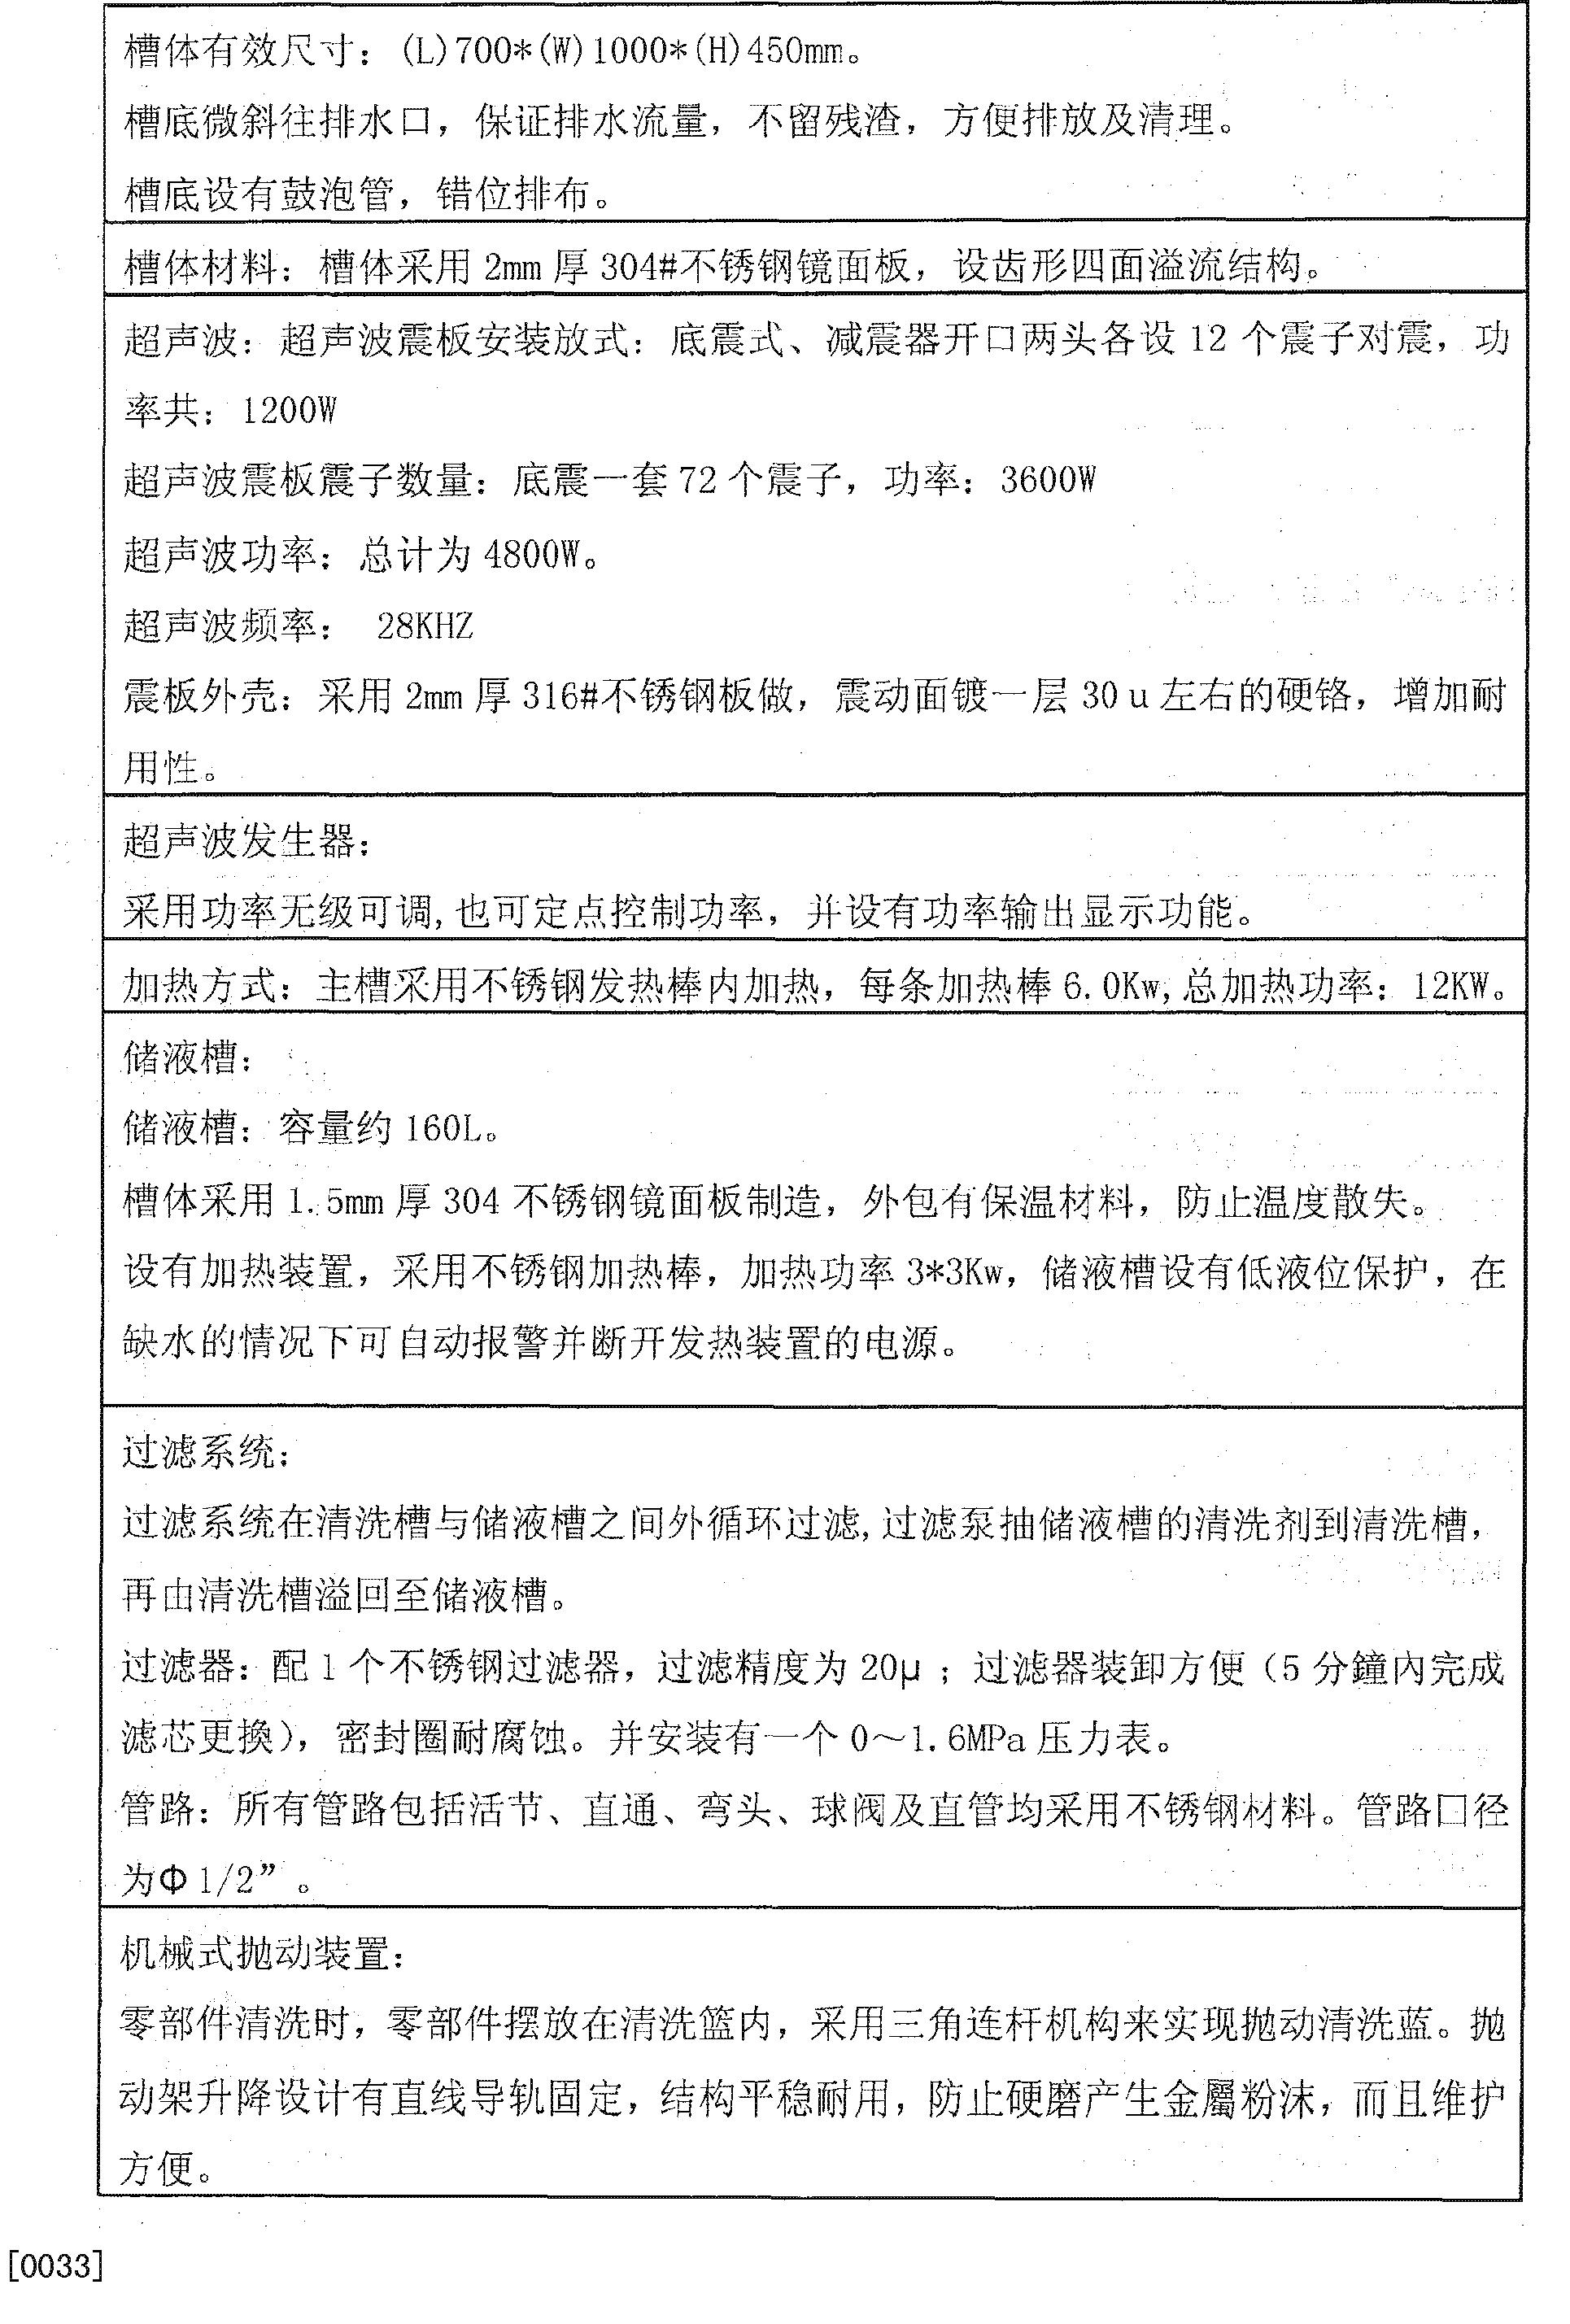 Figure CN204035120UD00061